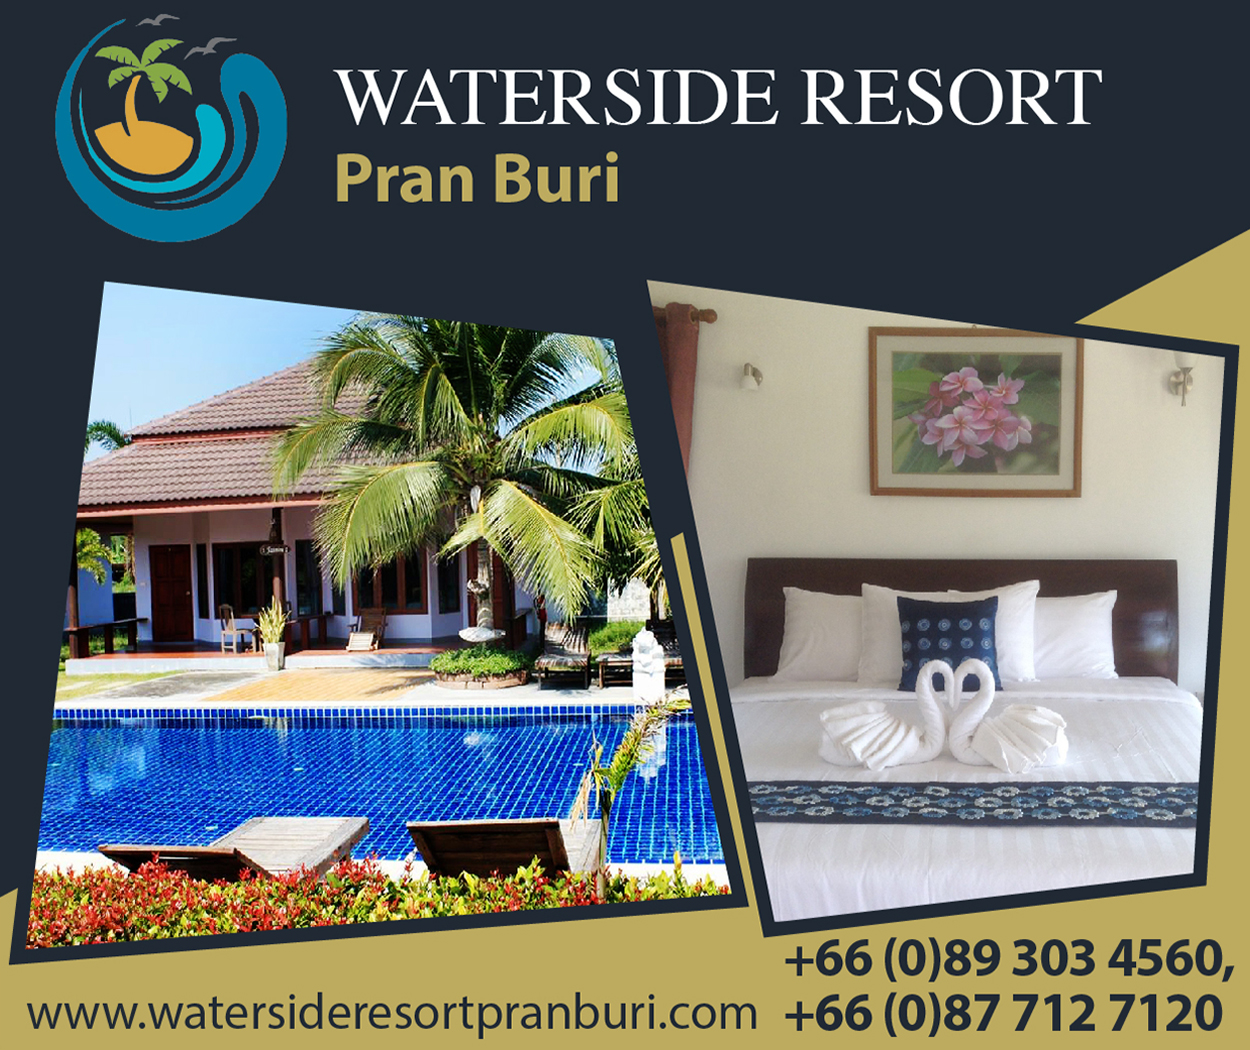 Waterside Resort Pran Buri